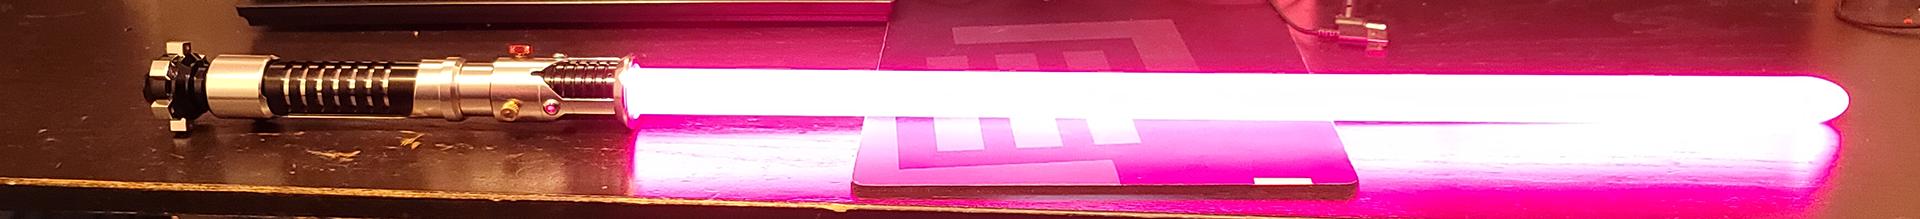 OWK1-Pink